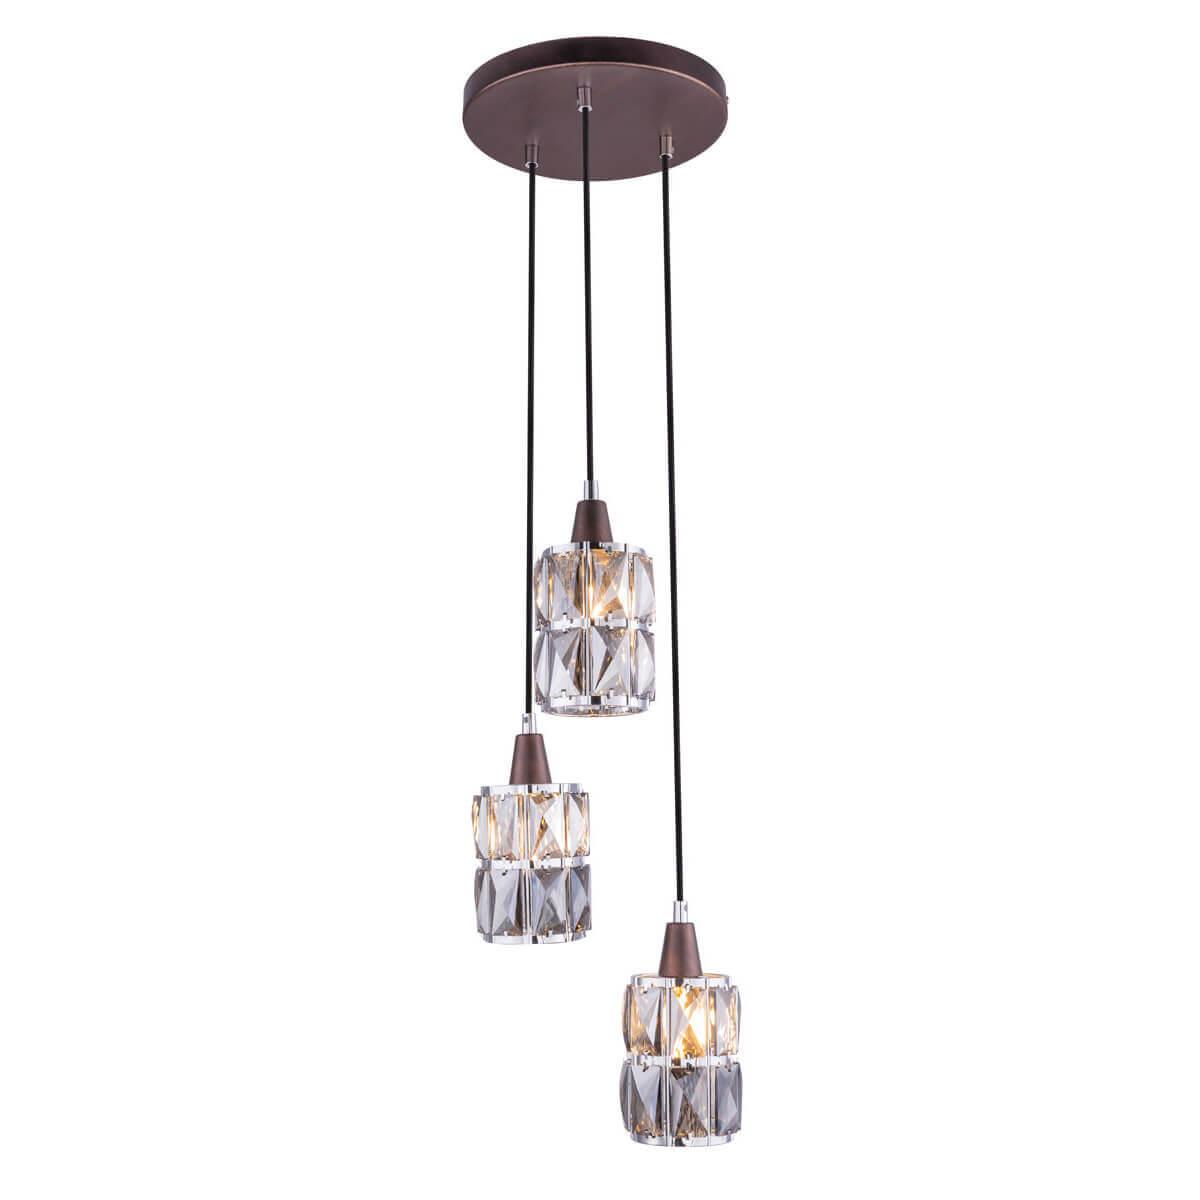 Светильник Globo 15761-3 Wolli подвесной светильник globo new 6905 3 бронза